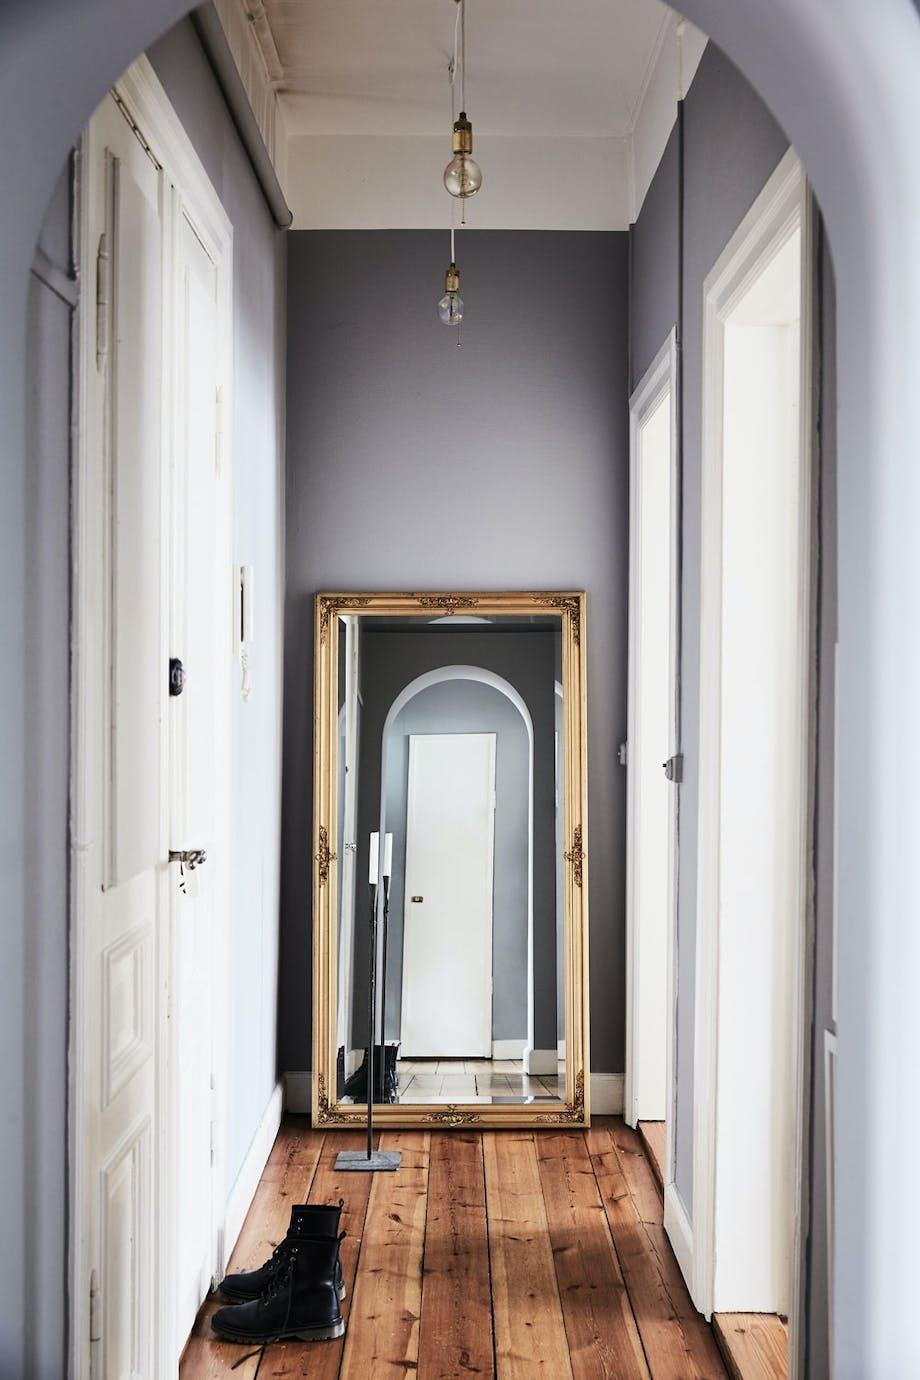 Forstørrende speil i entreen